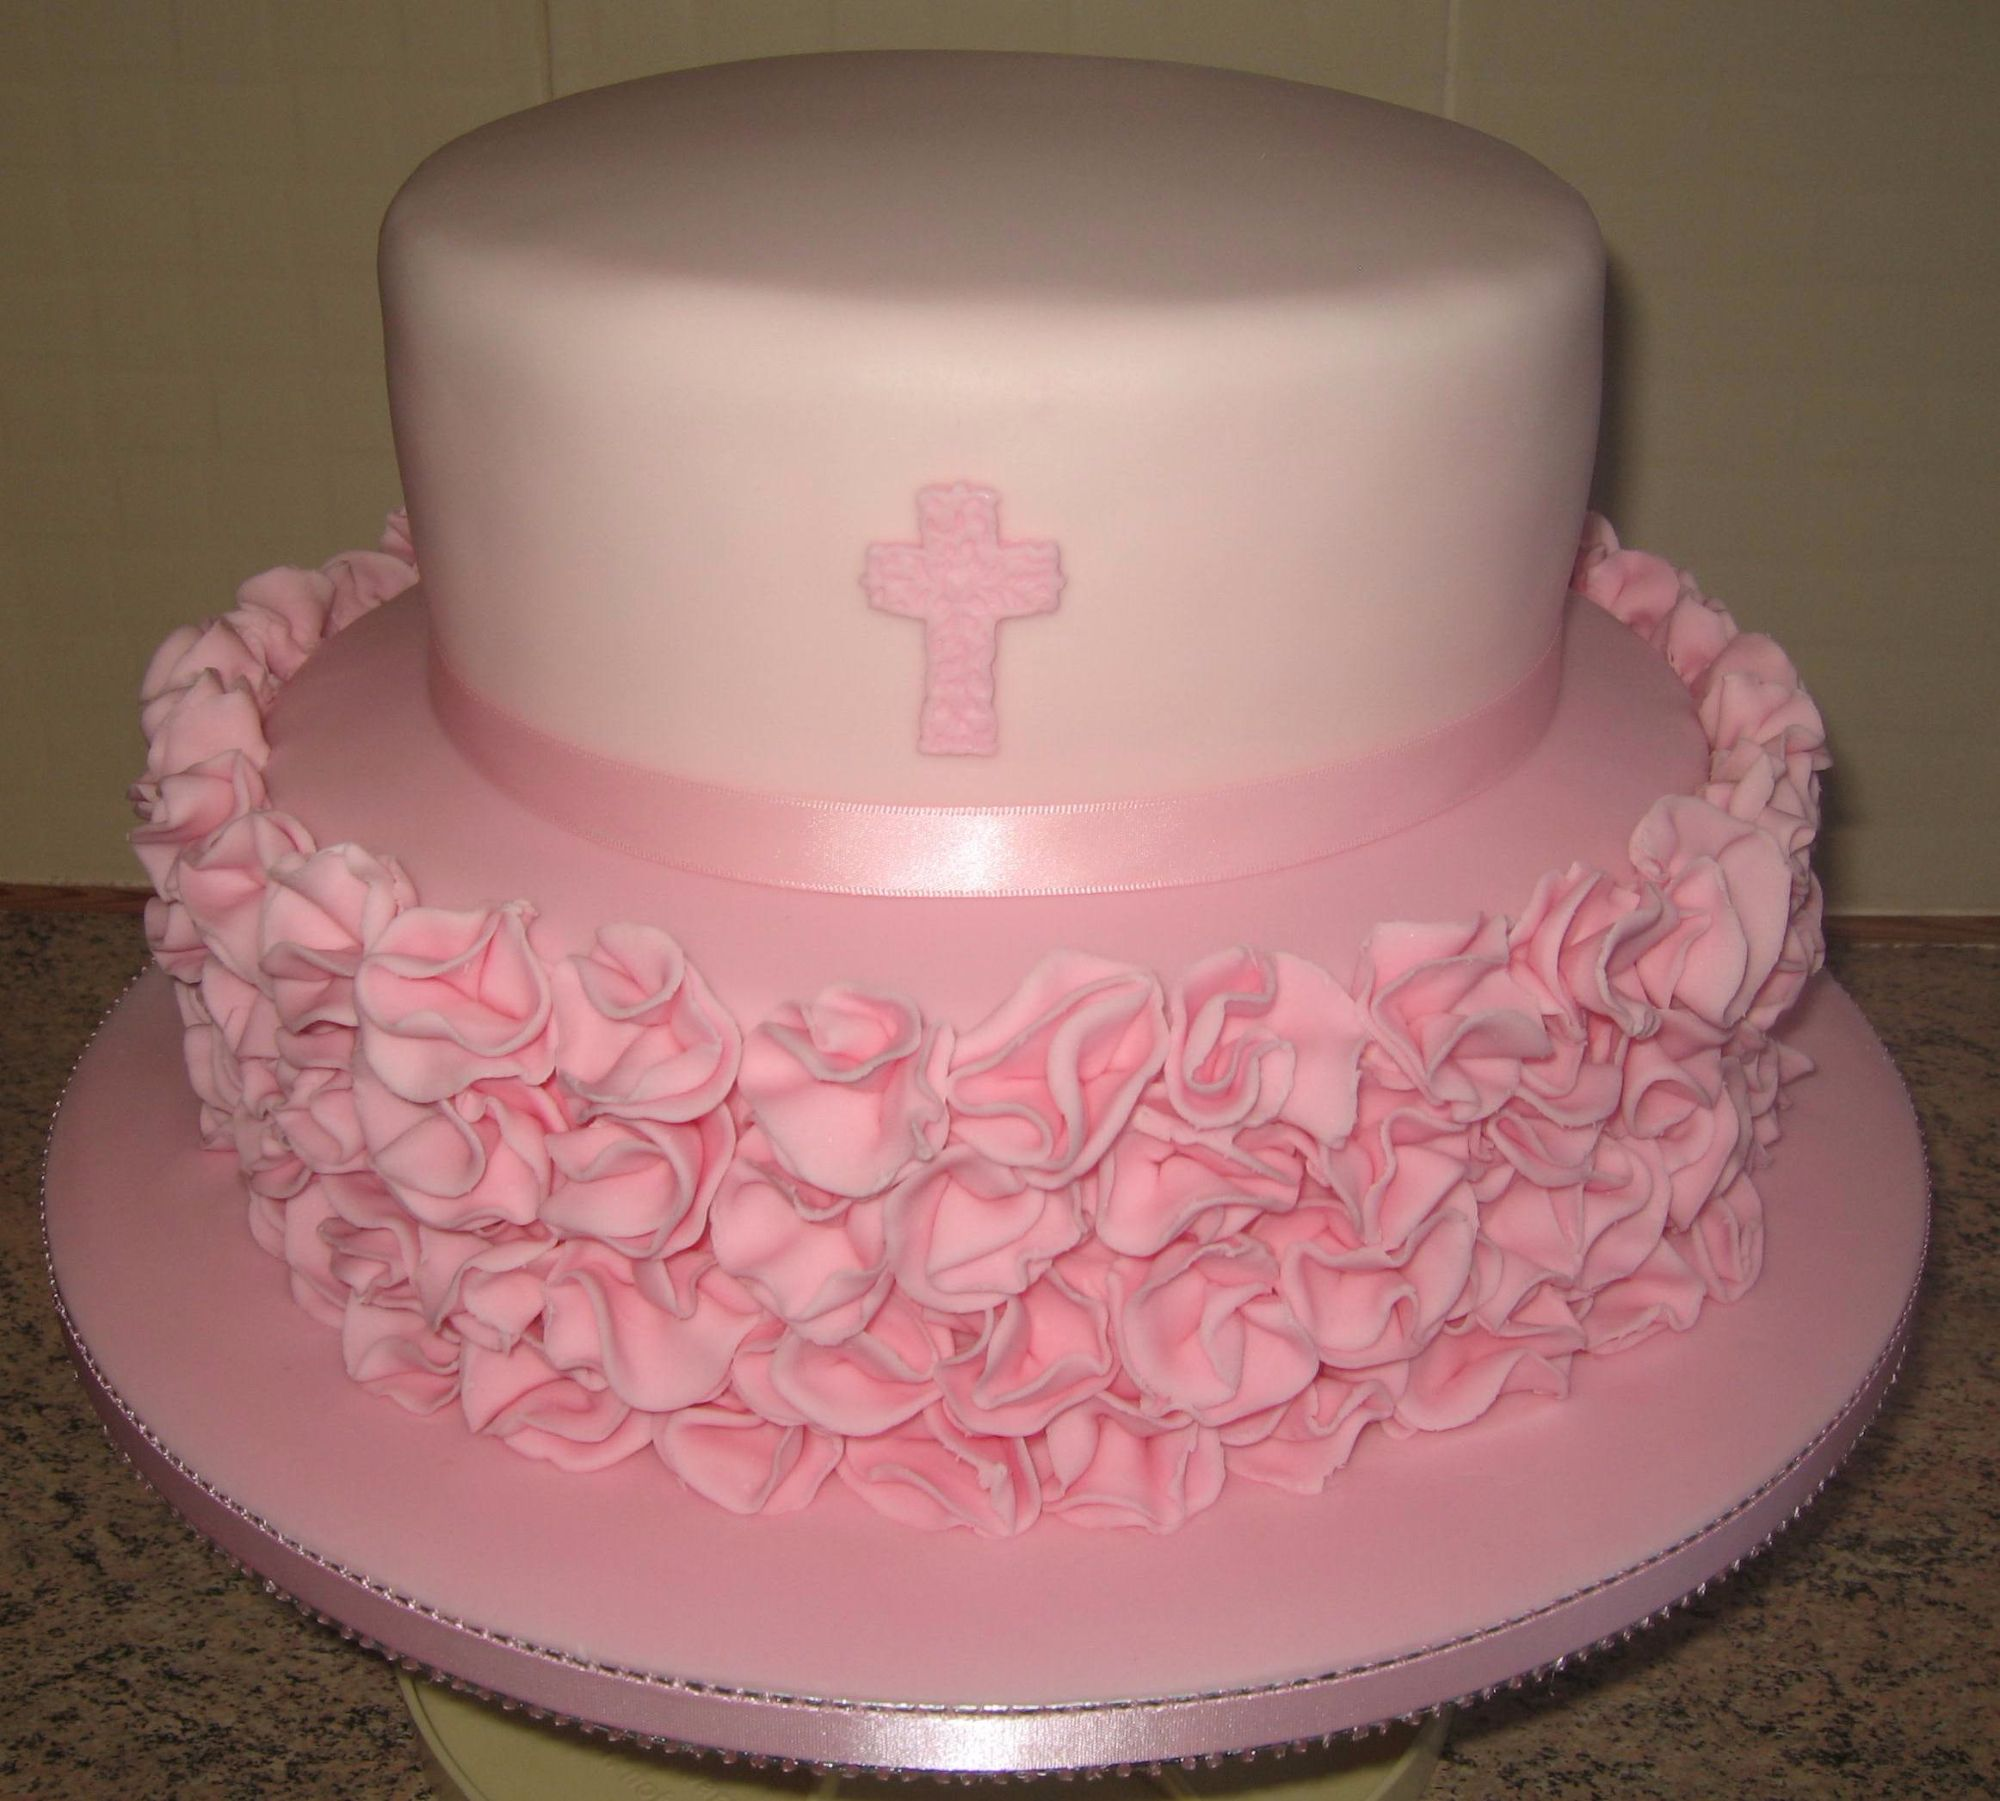 Cakes Sheffield: Birthday & Celebration Cakes a speciality ...